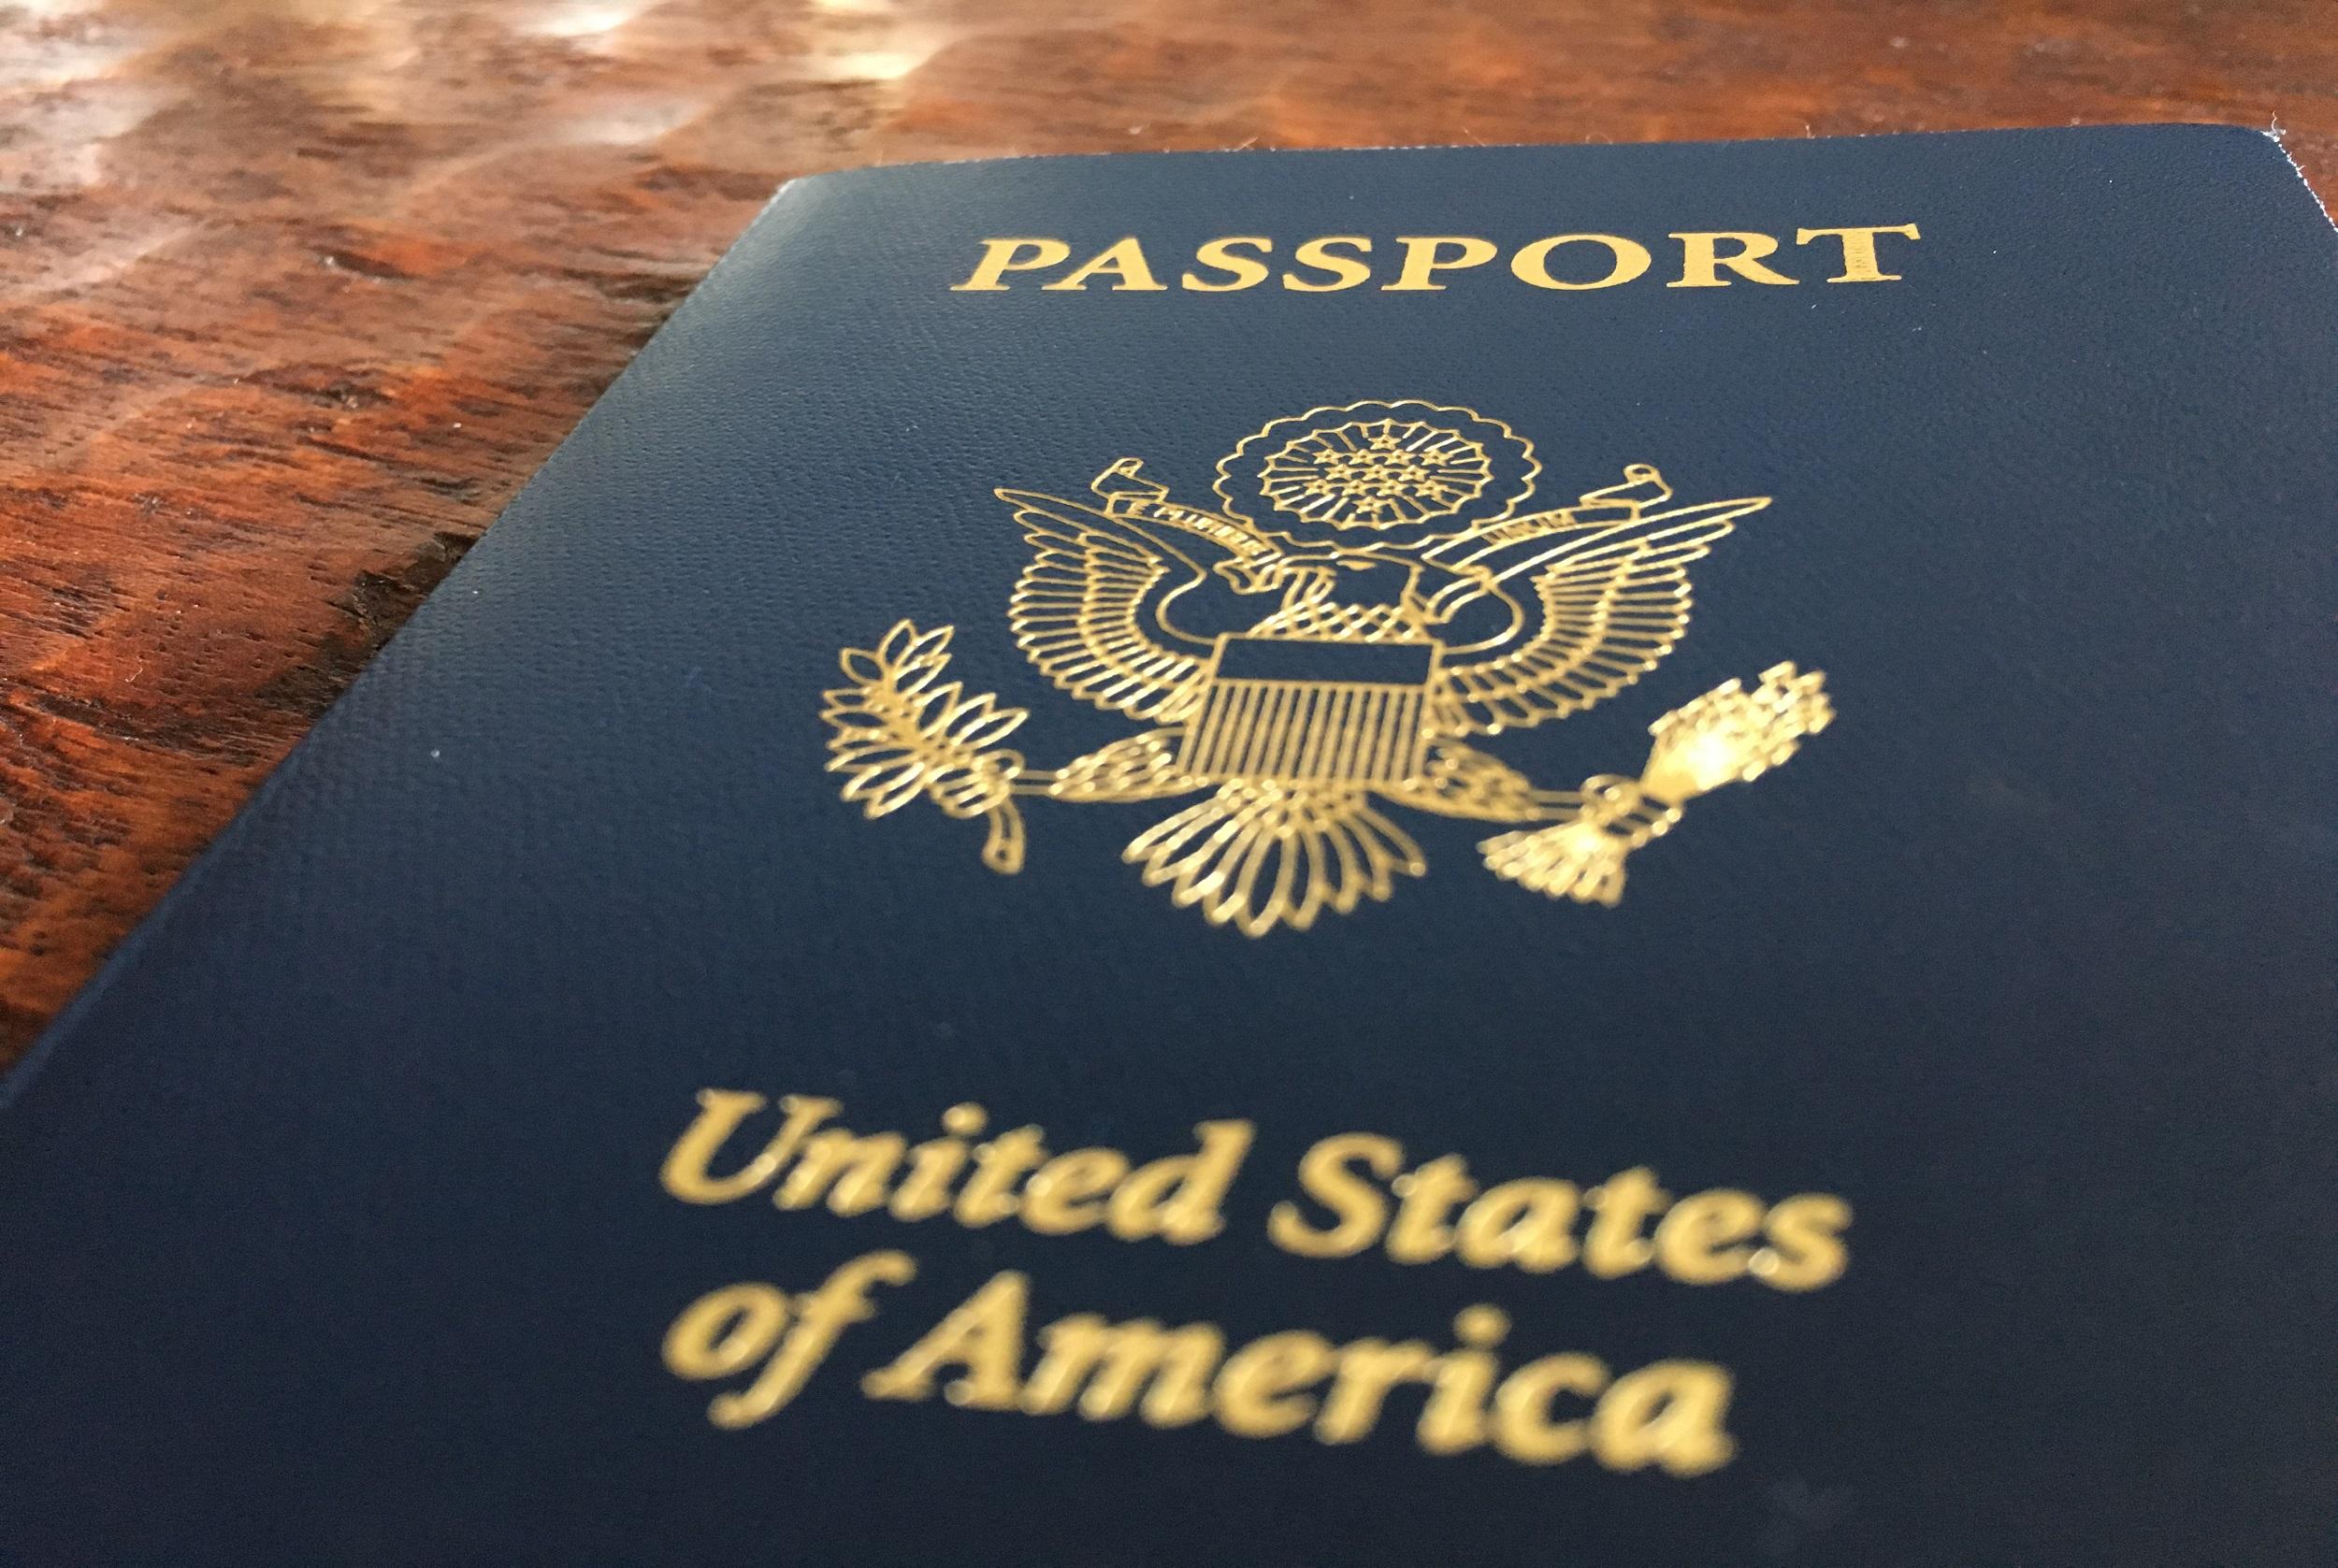 $400  Passport and student visa fees